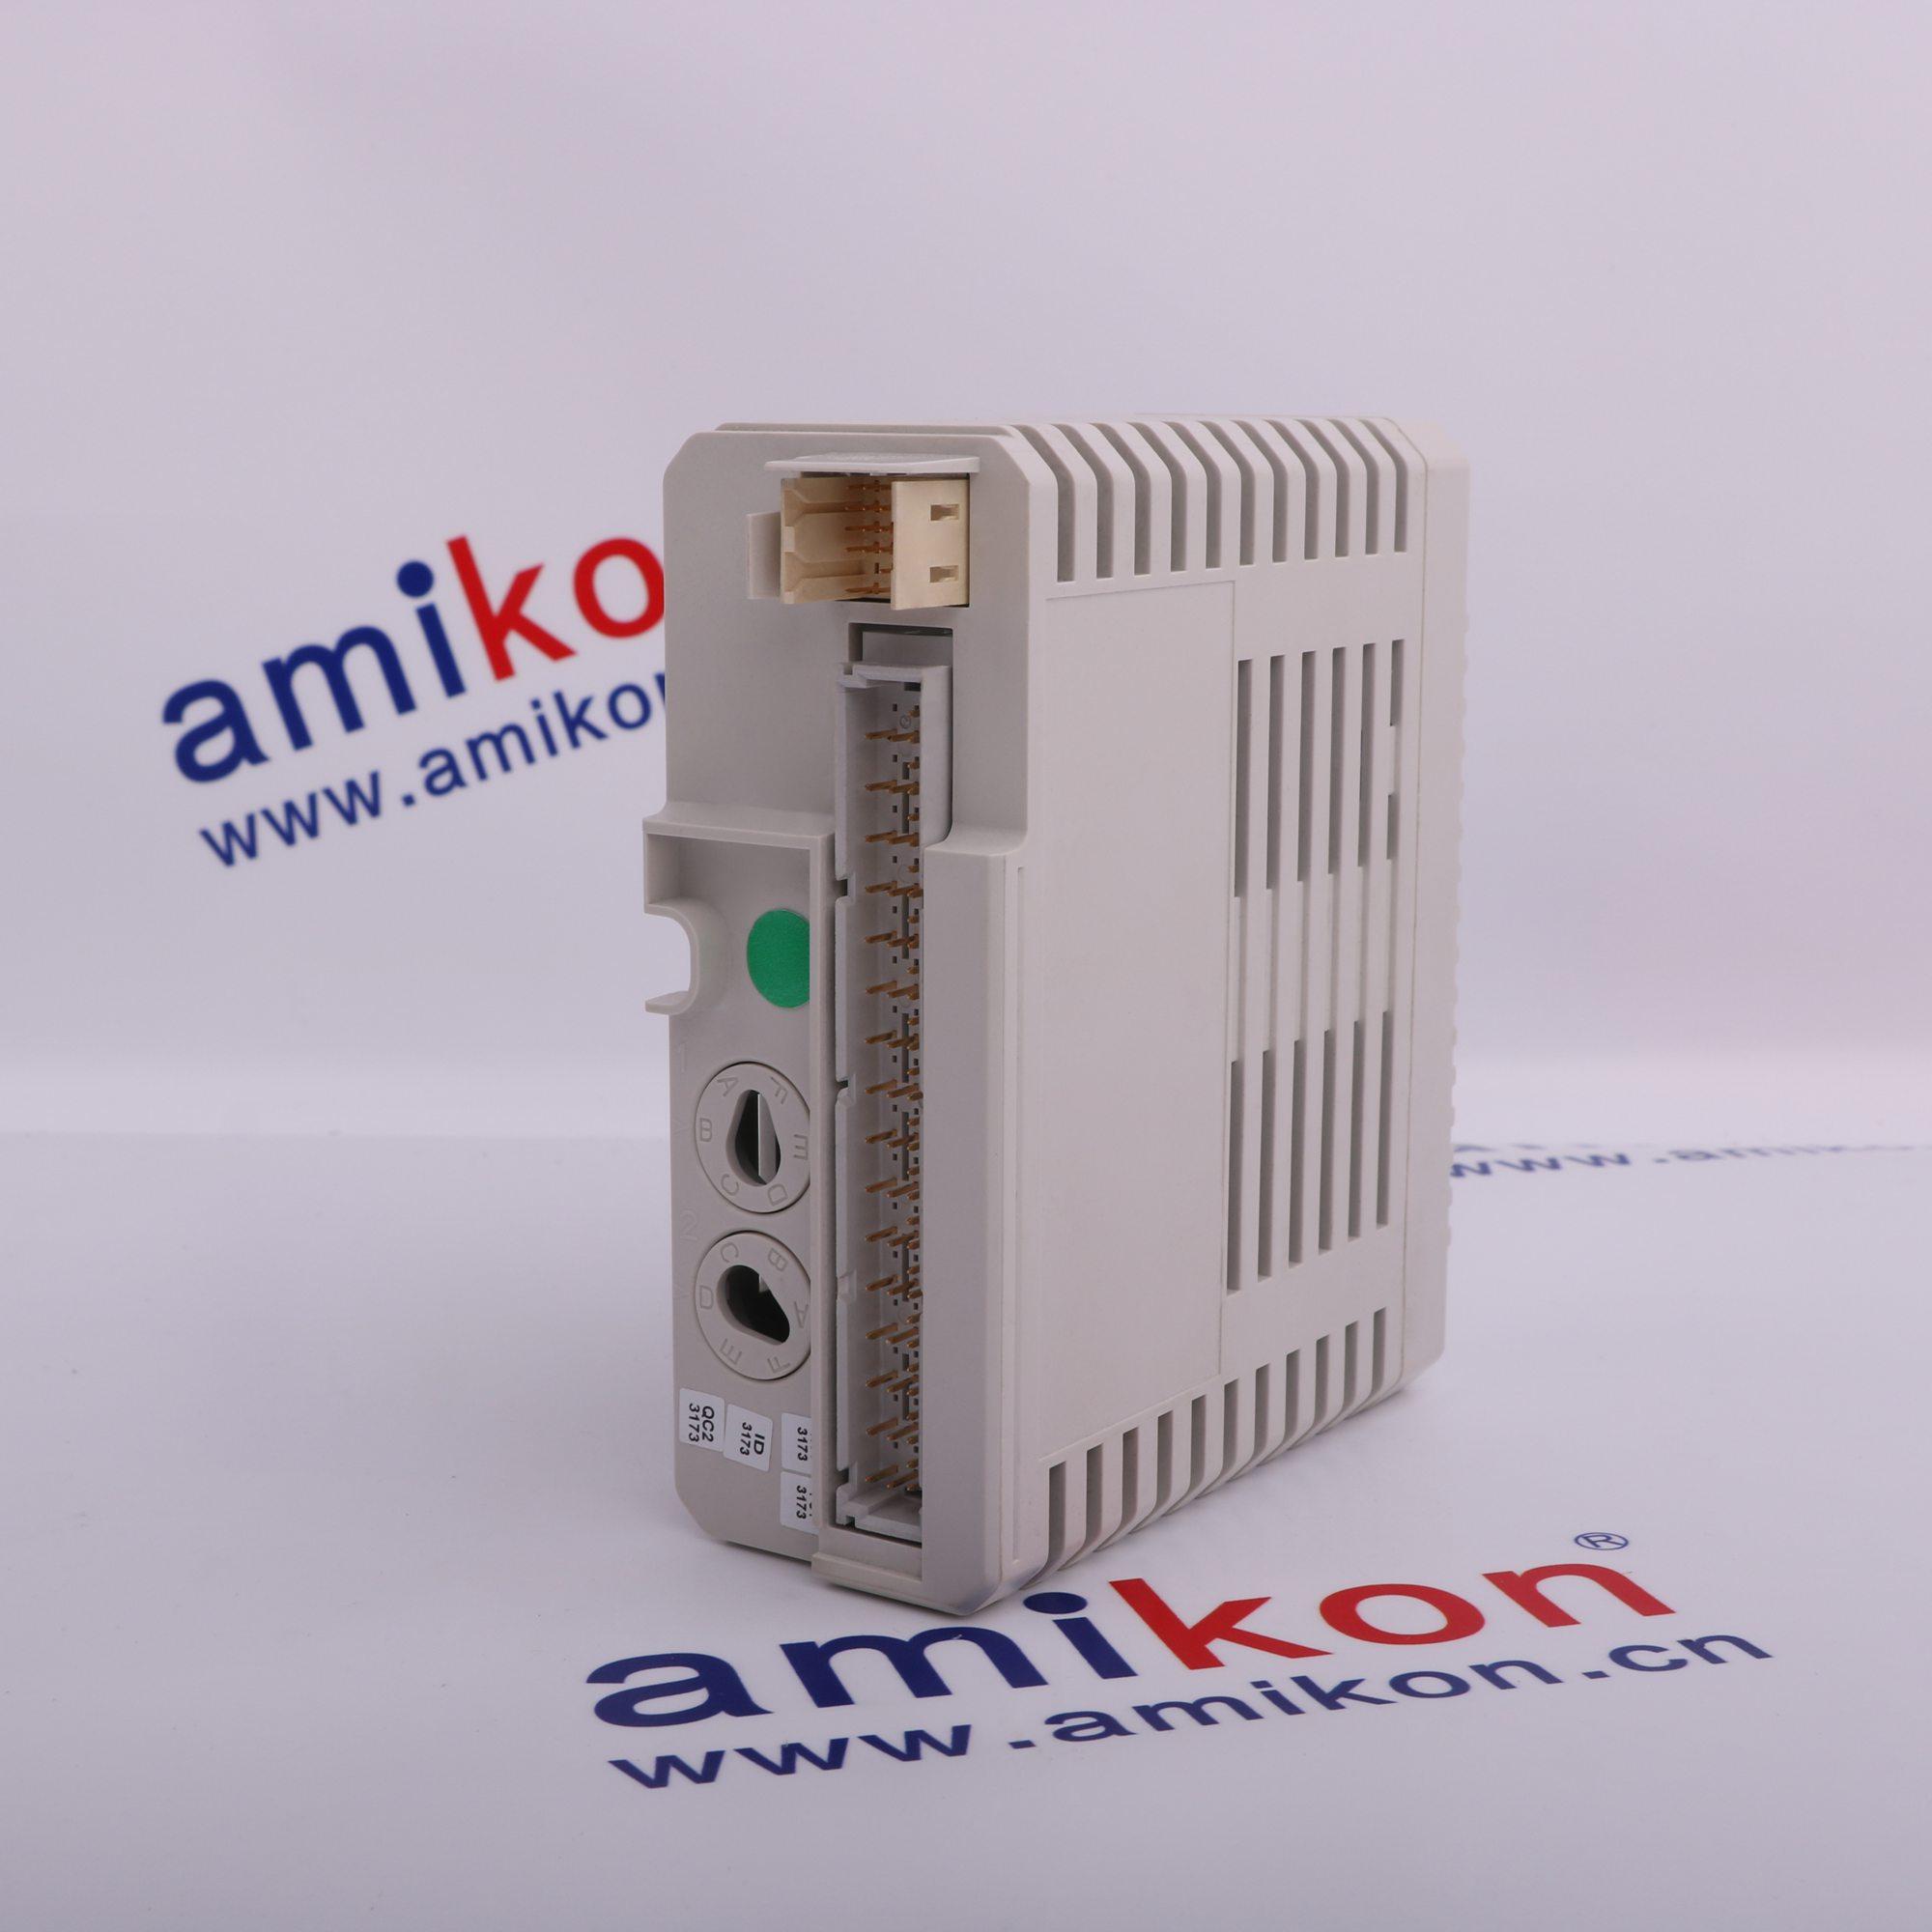 Allen Bradley 1756-L73 plc CPU ControlLogix electrical global on